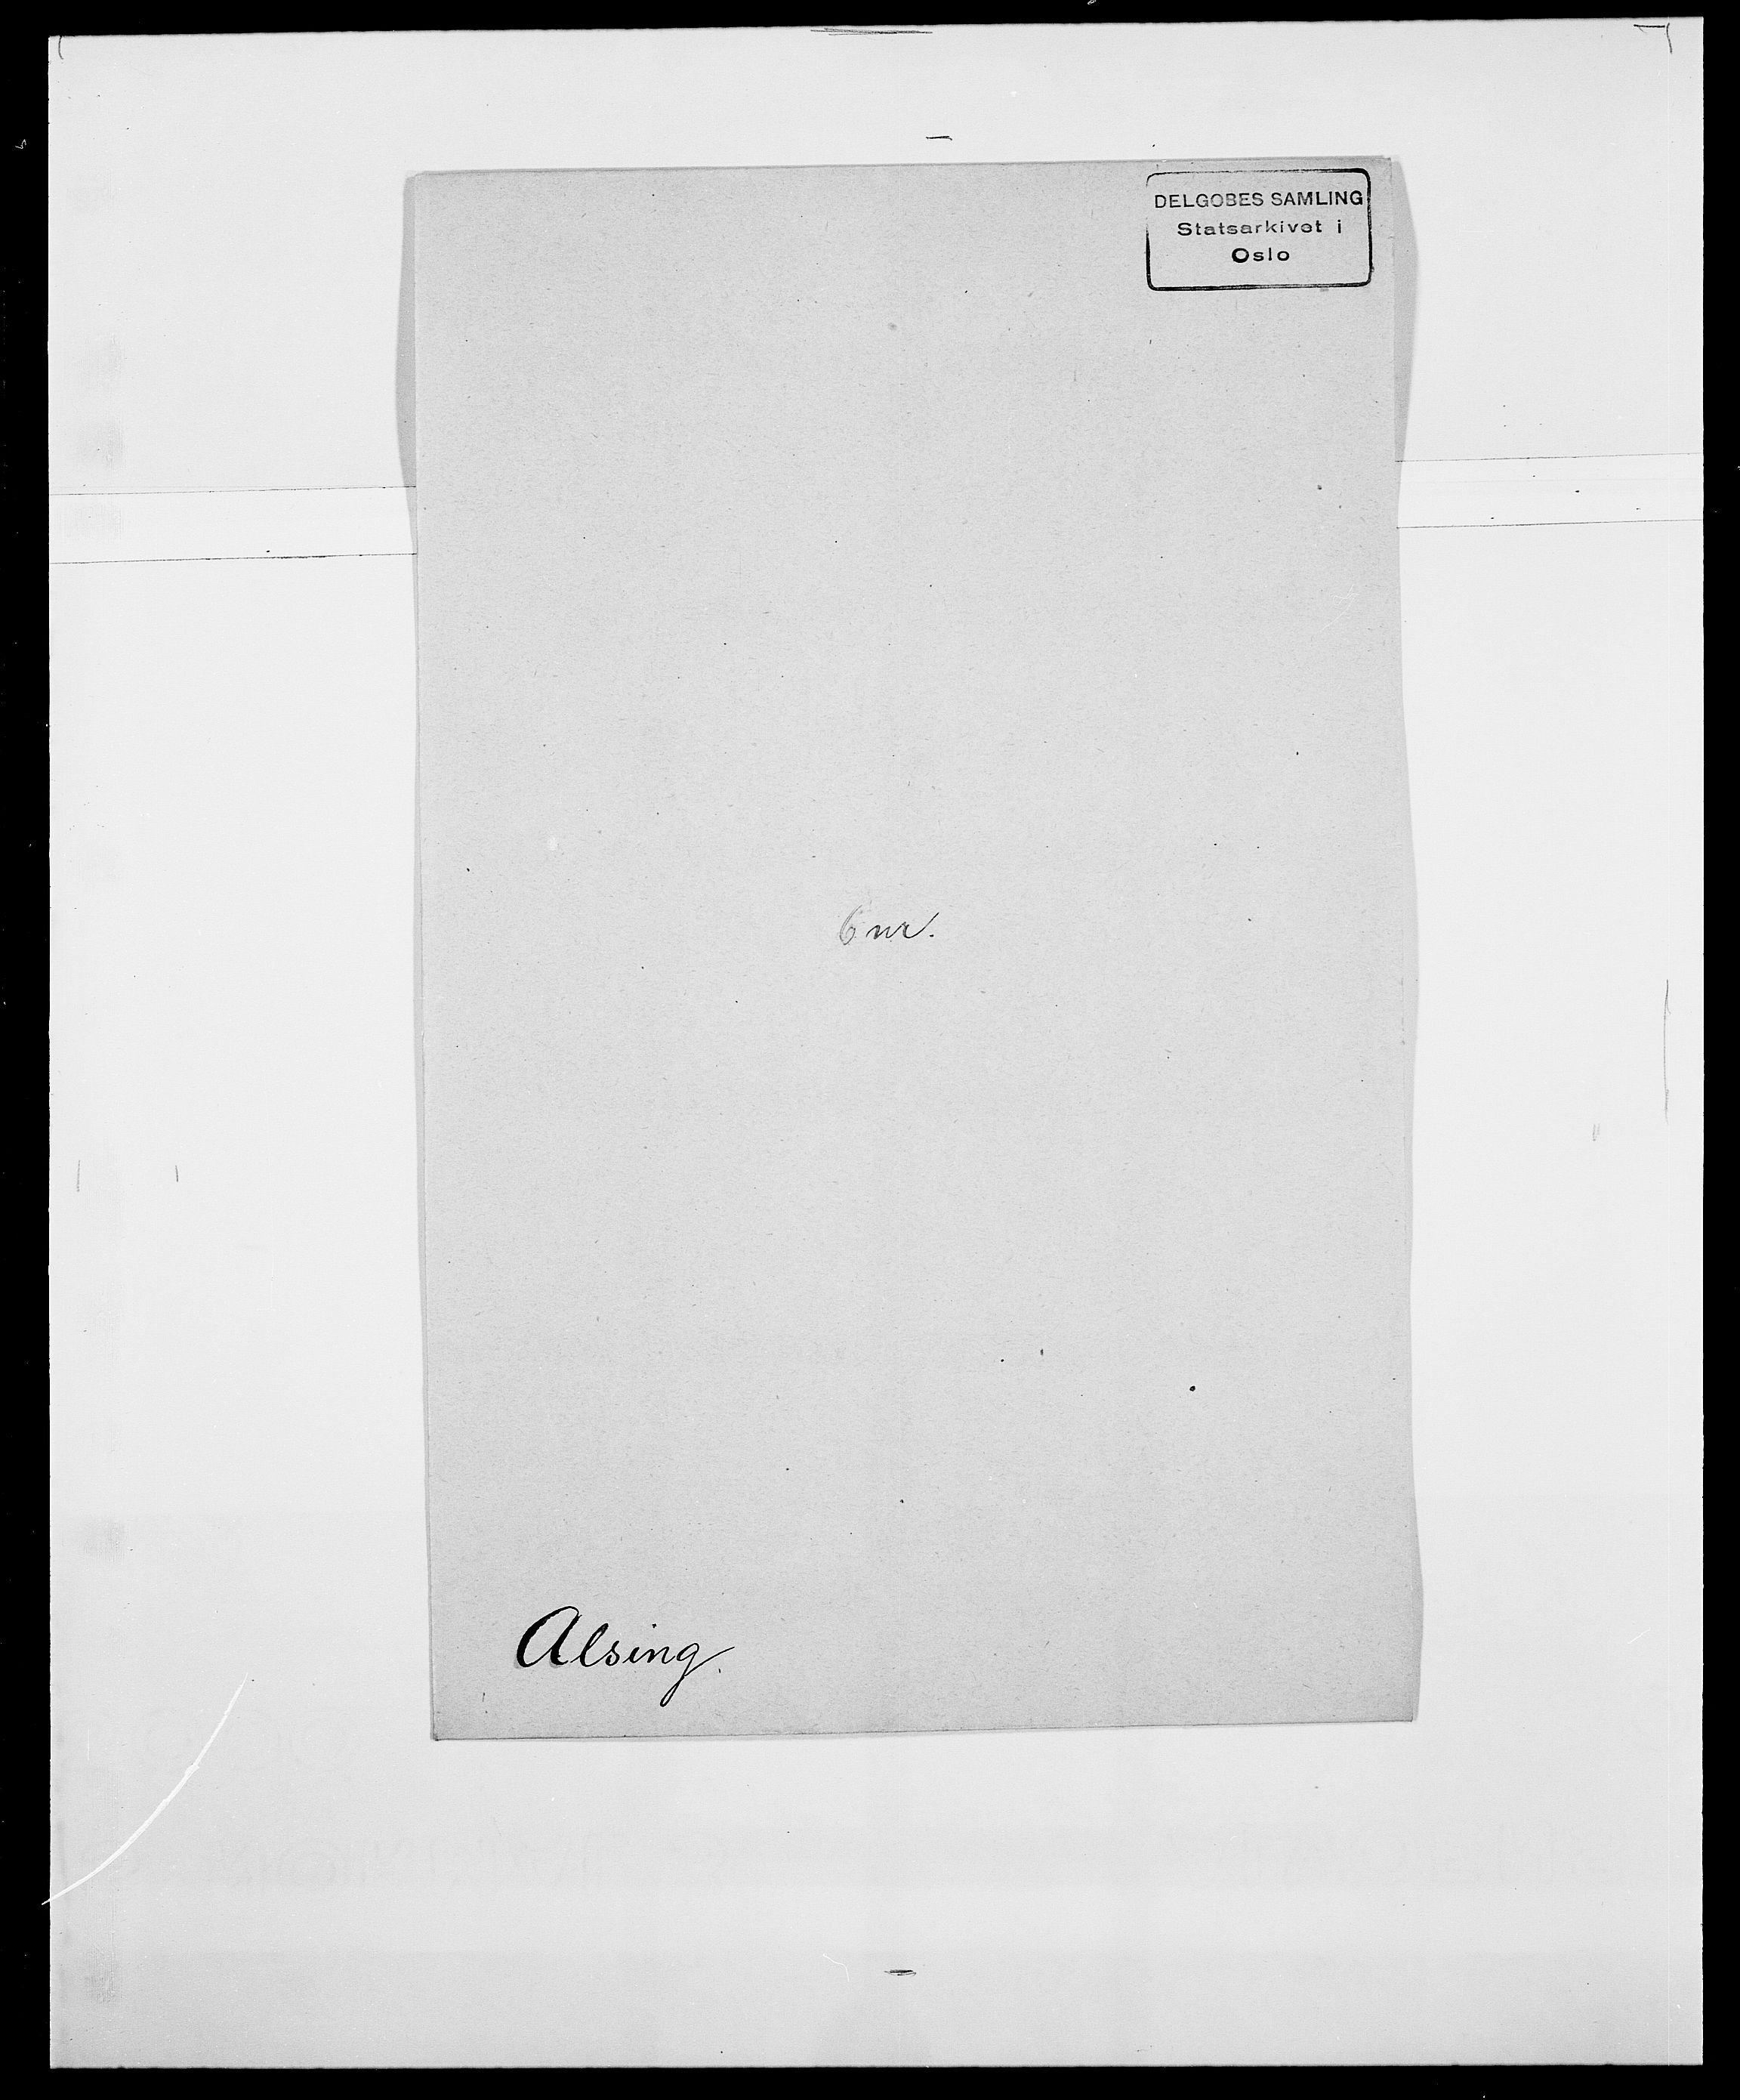 SAO, Delgobe, Charles Antoine - samling, D/Da/L0001: Aabye - Angerman, s. 458